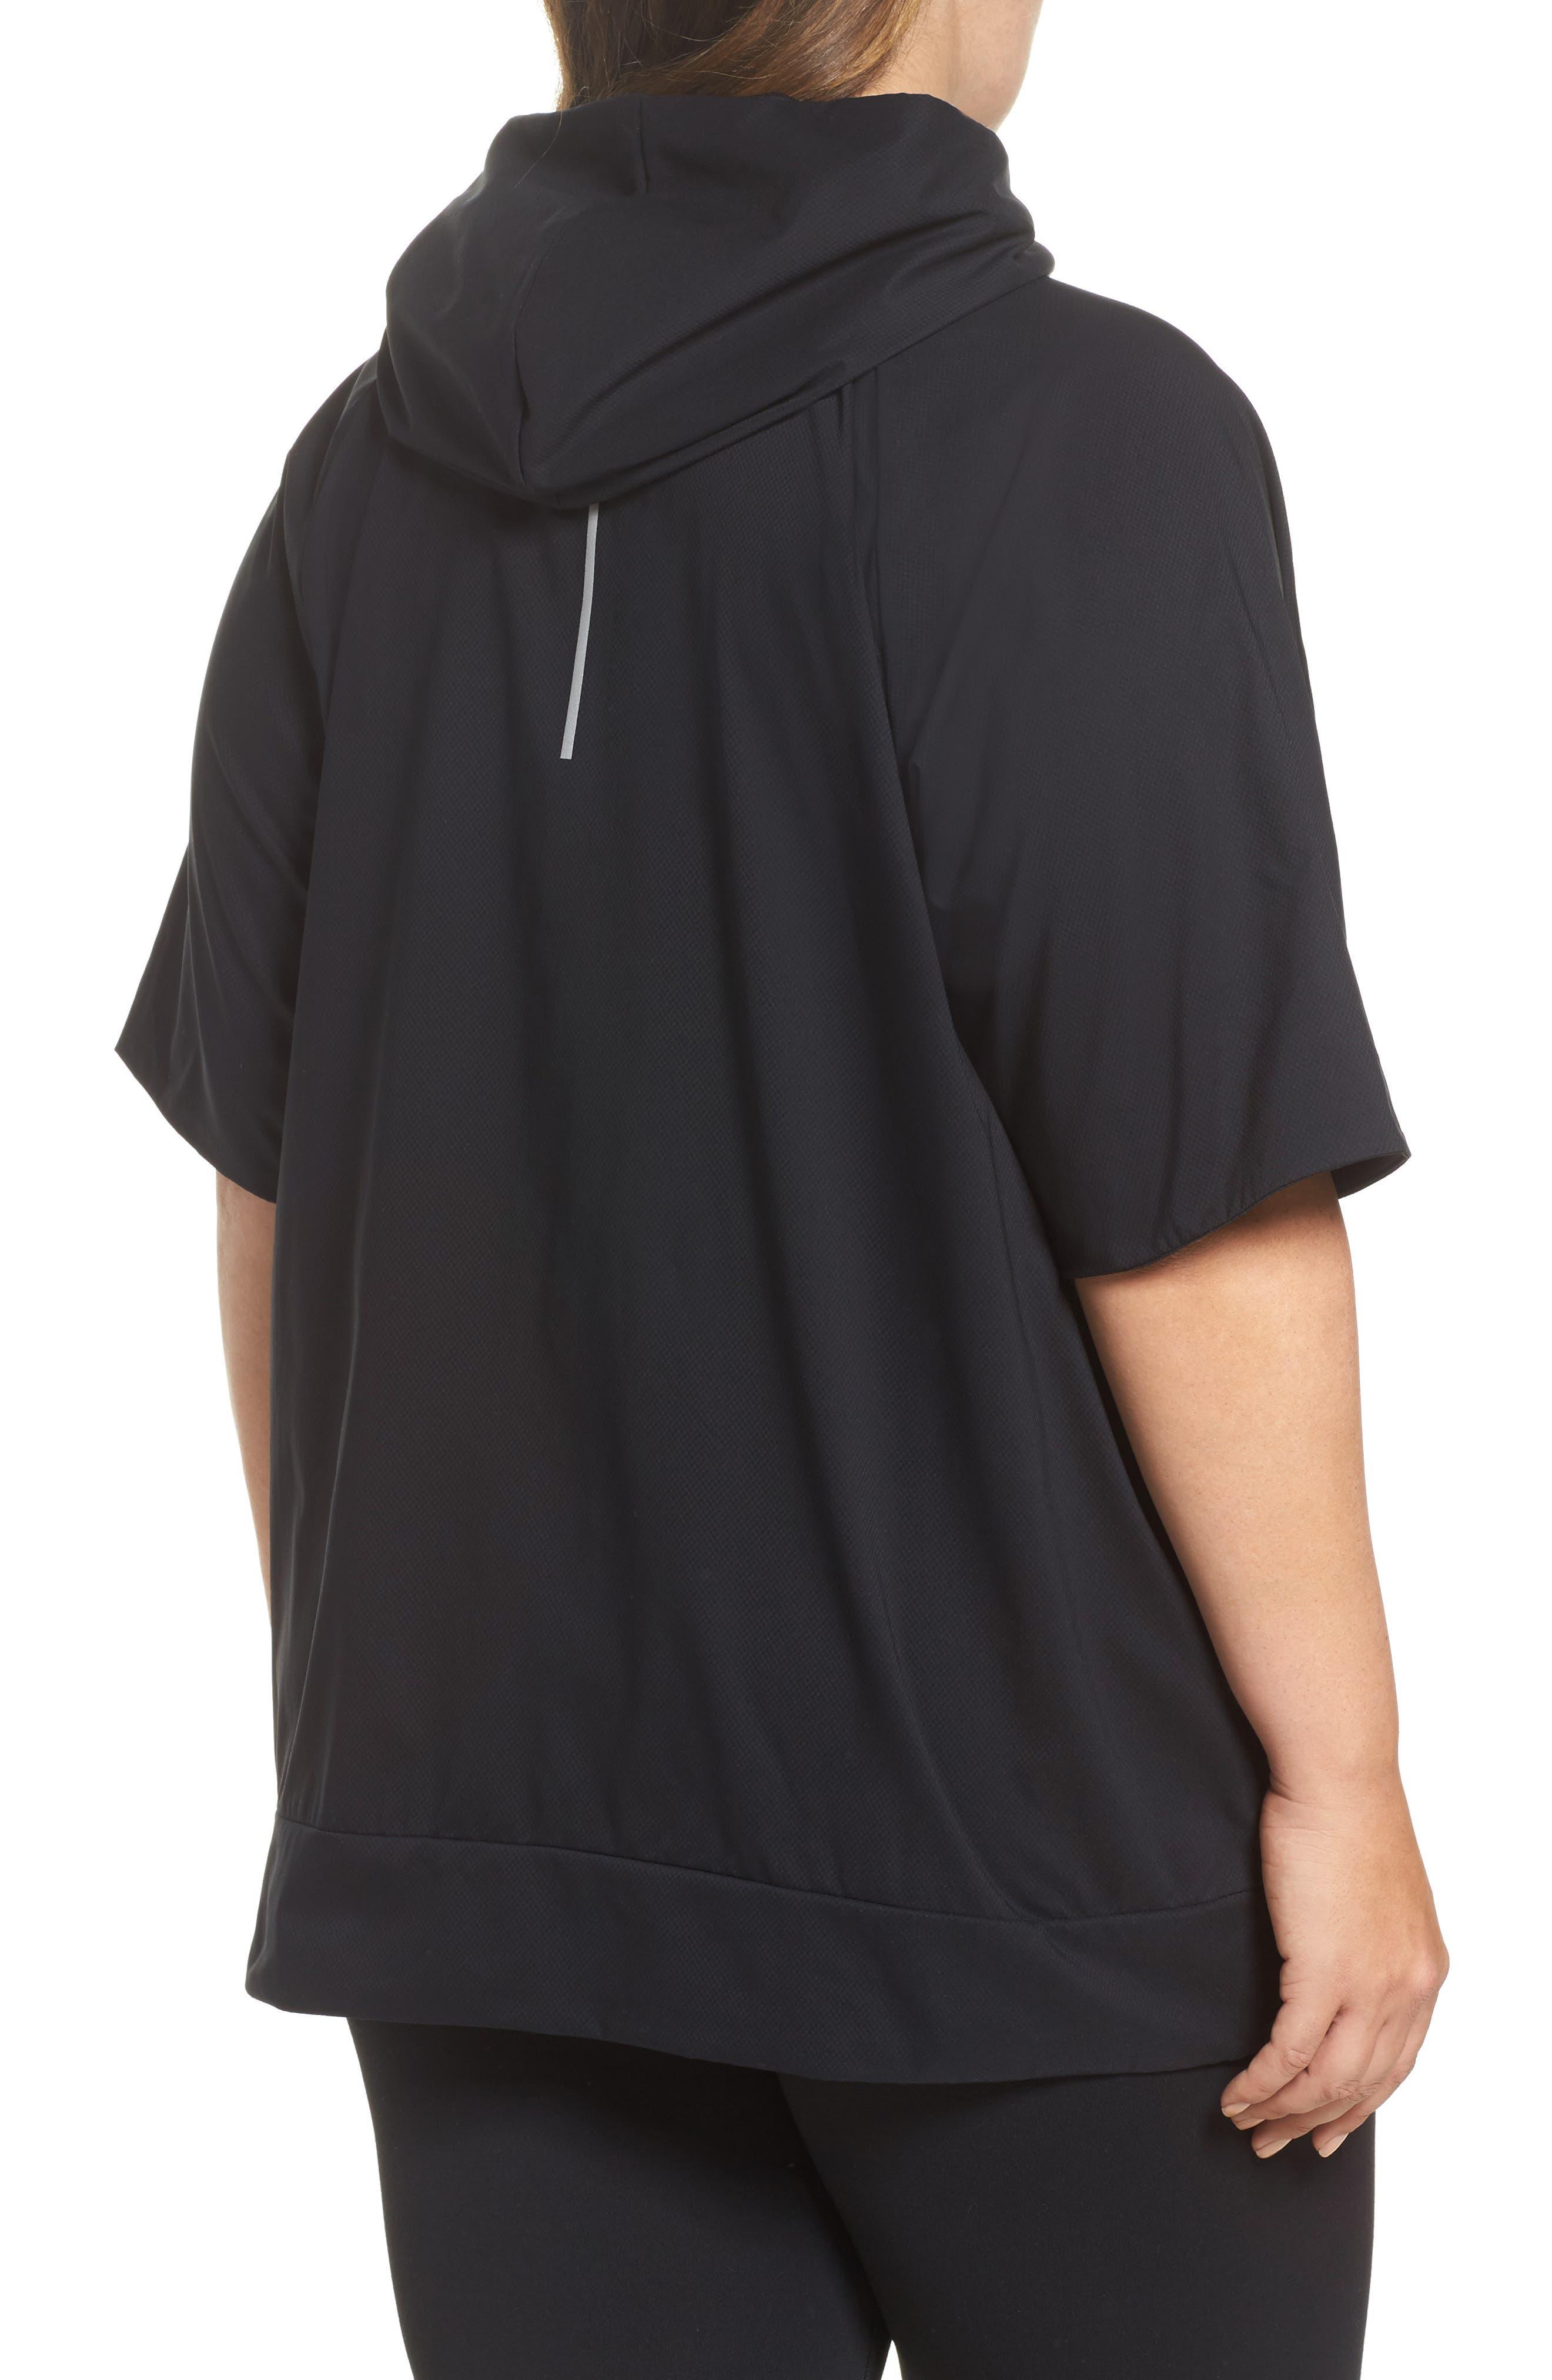 Flex Hooded Running Jacket,                             Alternate thumbnail 2, color,                             Black